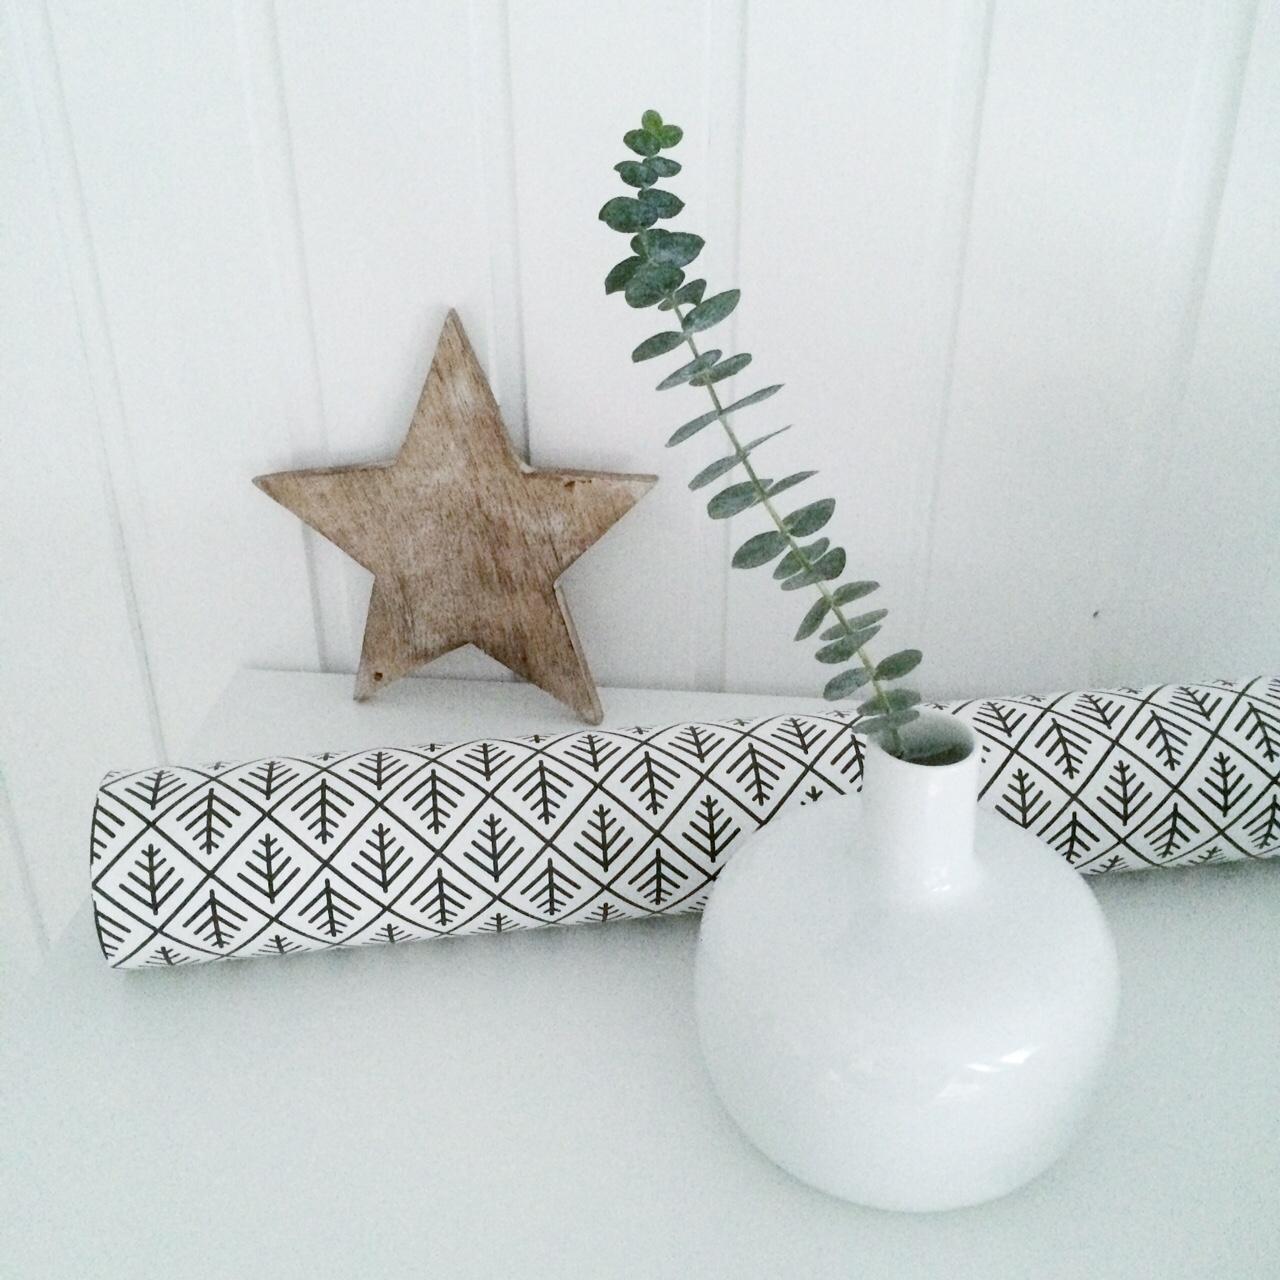 xmas decoration simple, pure